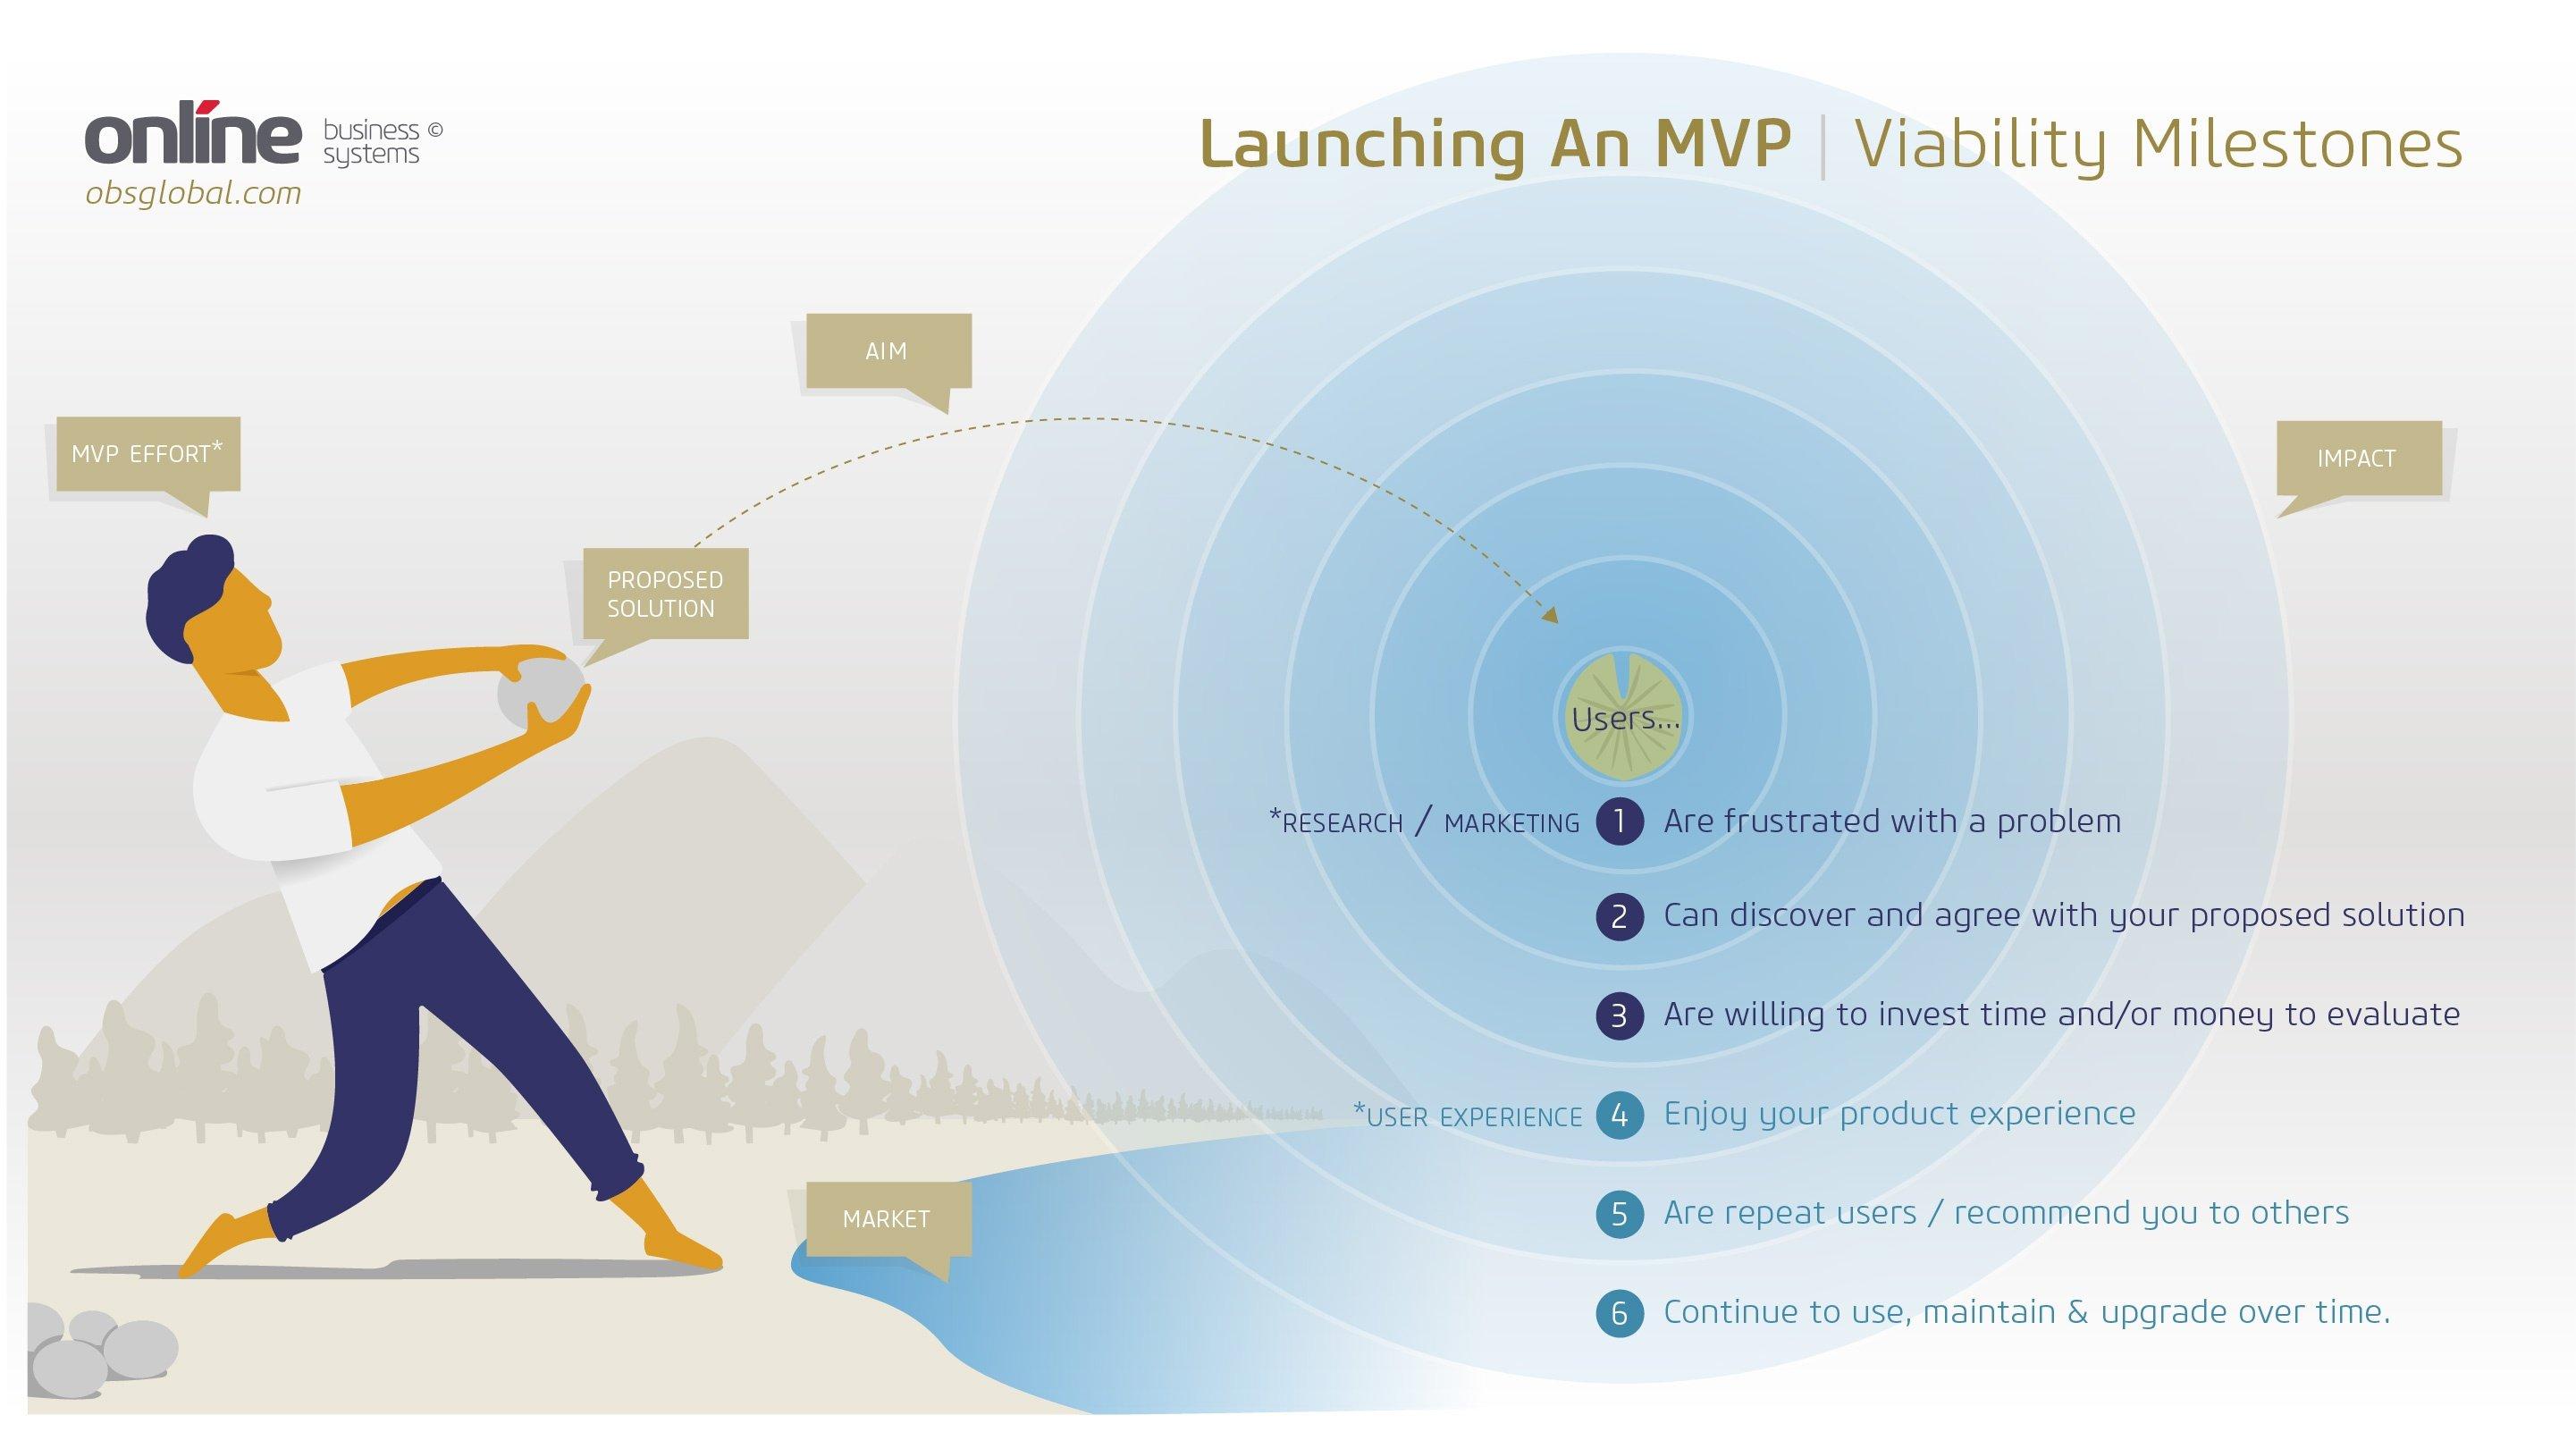 Viability Milestones@2x-80.jpg